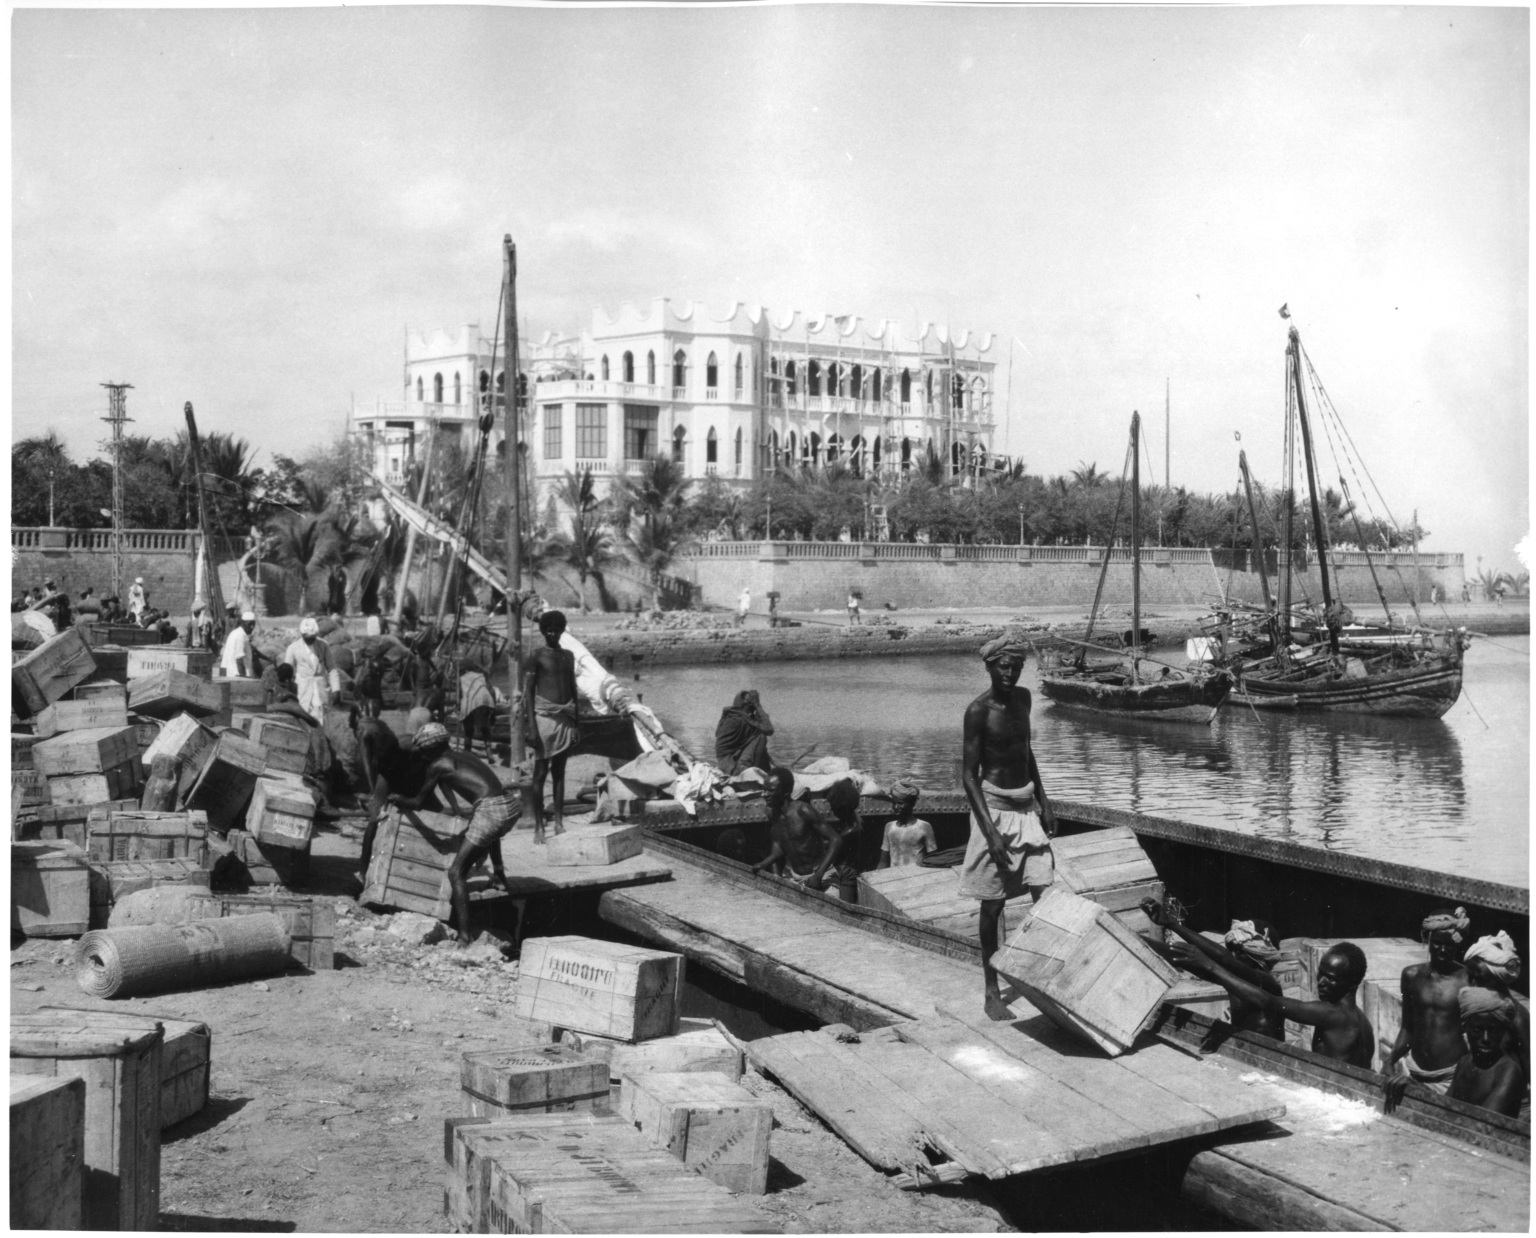 Harbor and Presidential Palace in Djibouti City, Djibouti